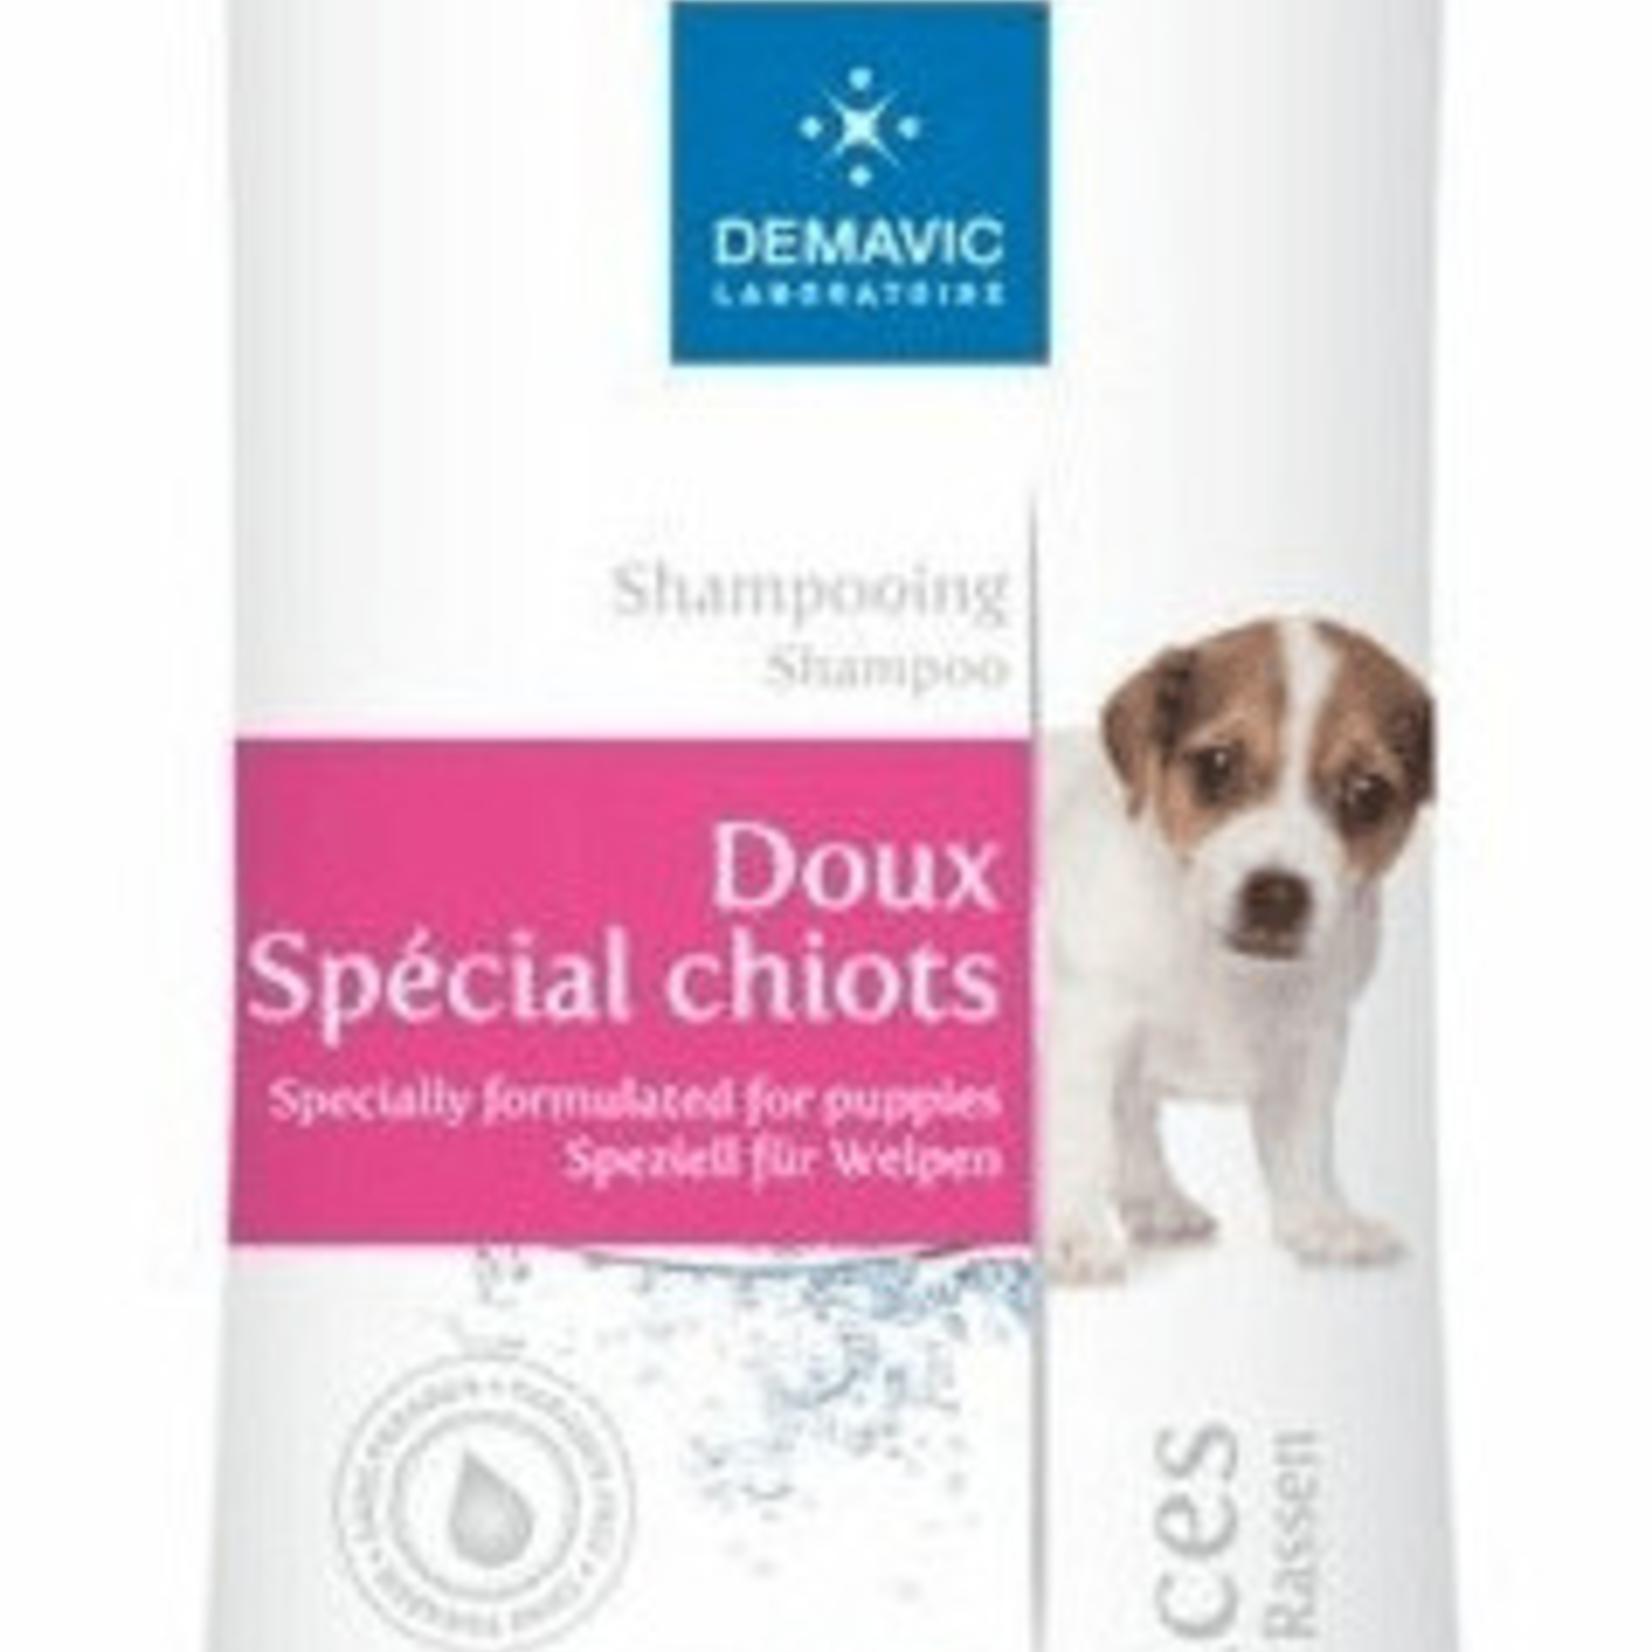 Demavic Gentle Shampoo - Puppies - 250 ml